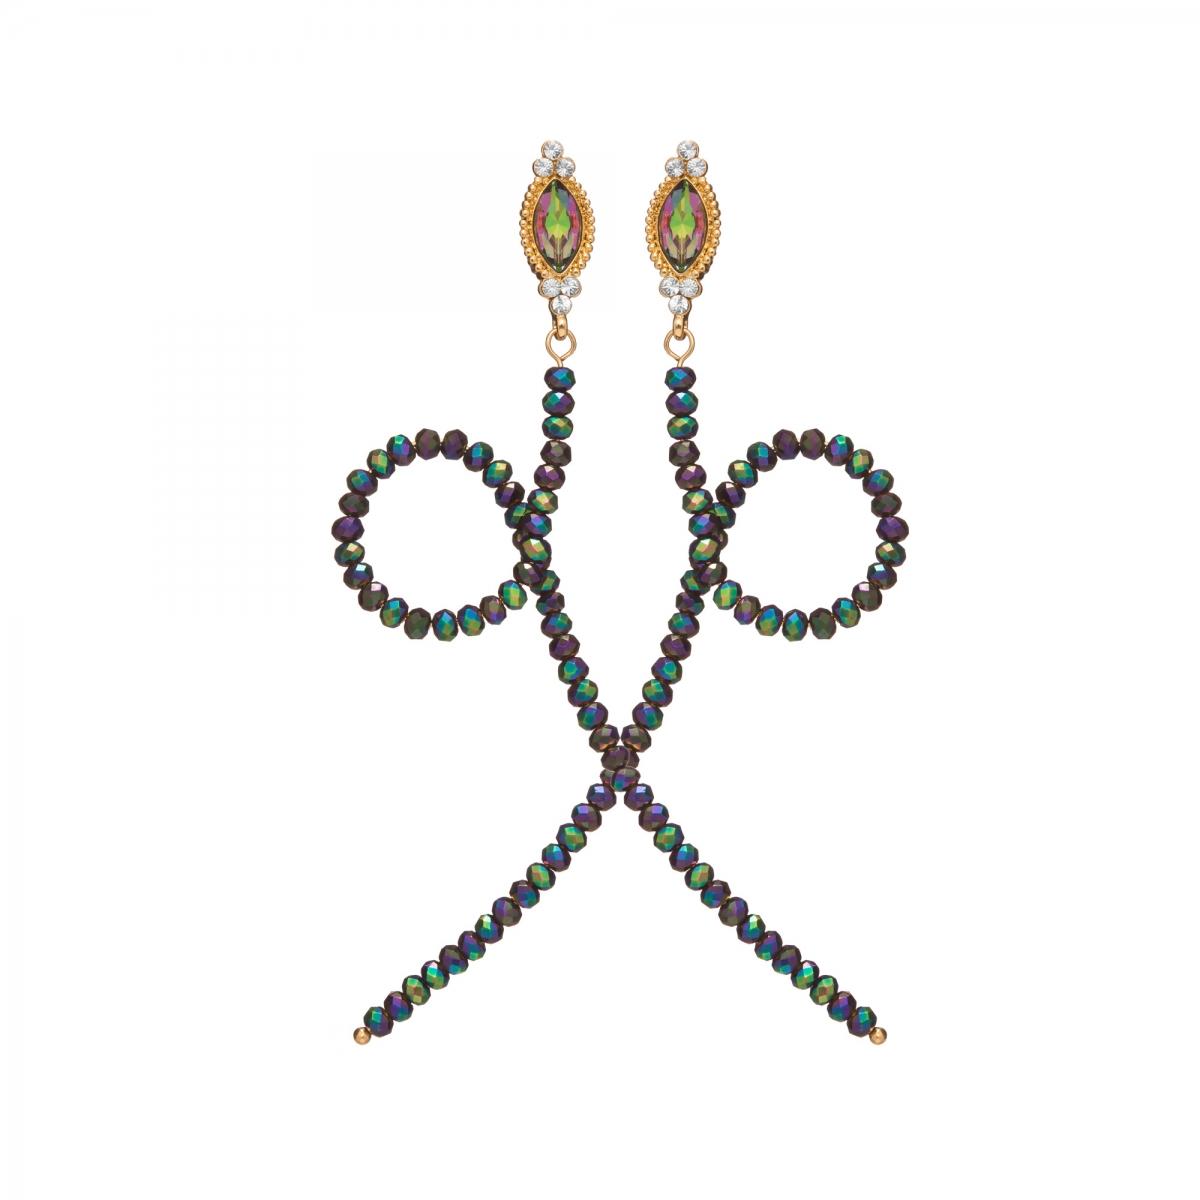 Náušnice Simple Fashion Snake Green Metal Crystal Beads